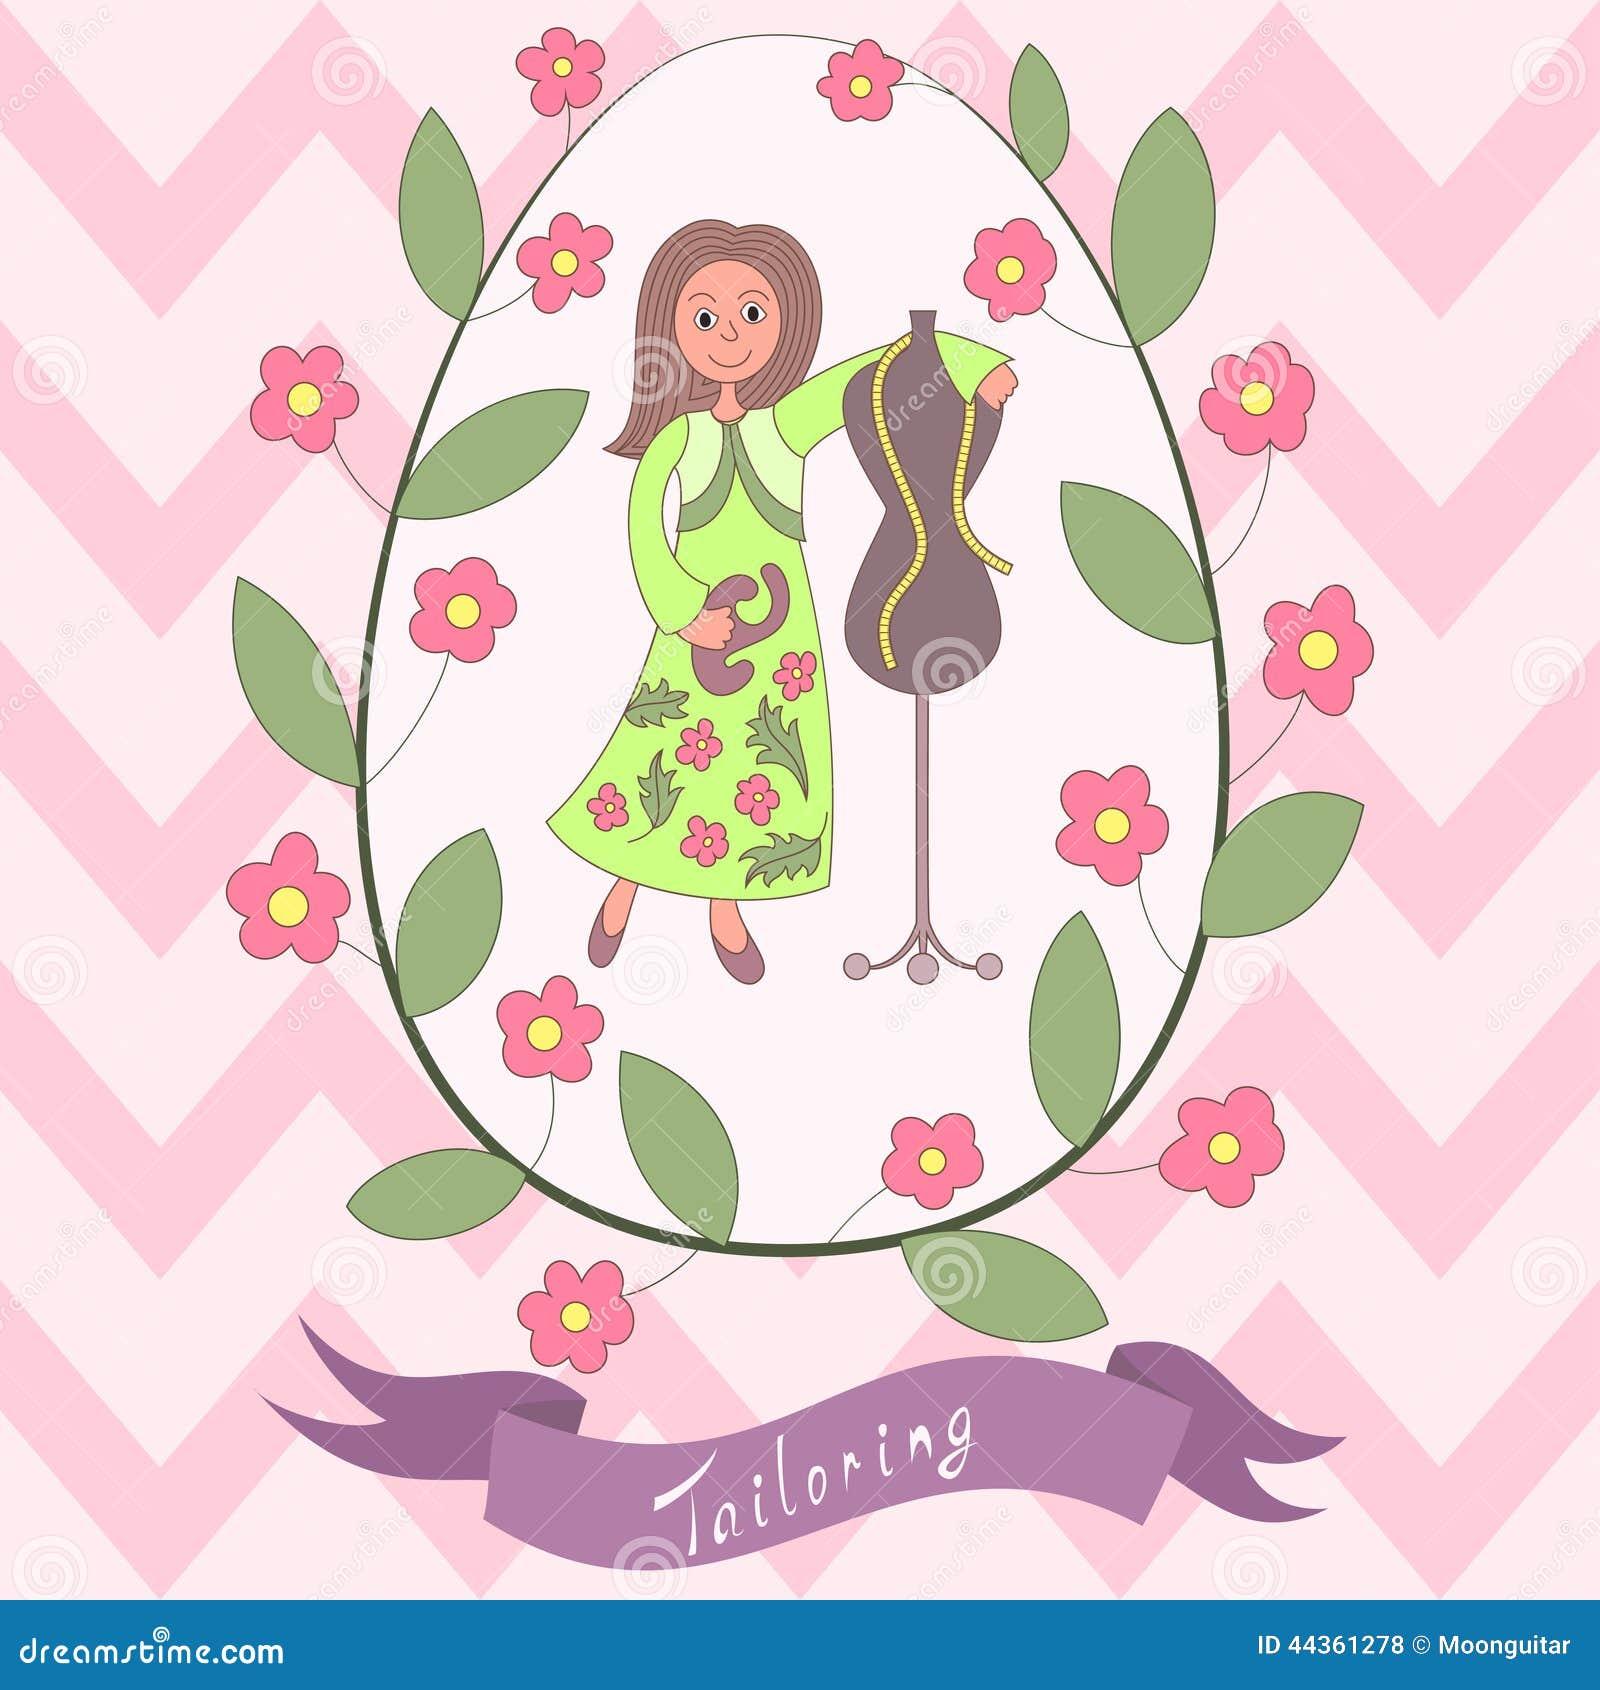 Cute romantic card with happy cartoon seamstress